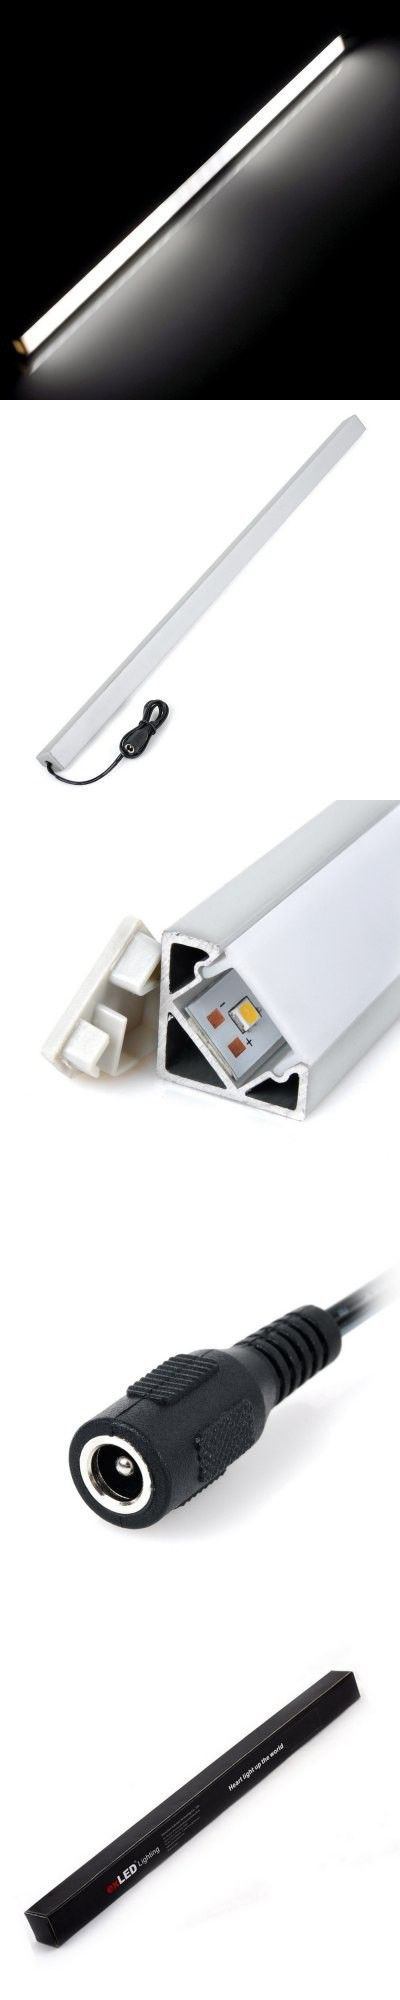 LED Strips | 50cm 600LM 7W 30 SMD 3528 LEDs Tube Light Bar Frost Light Strip ( 4500K 24V )